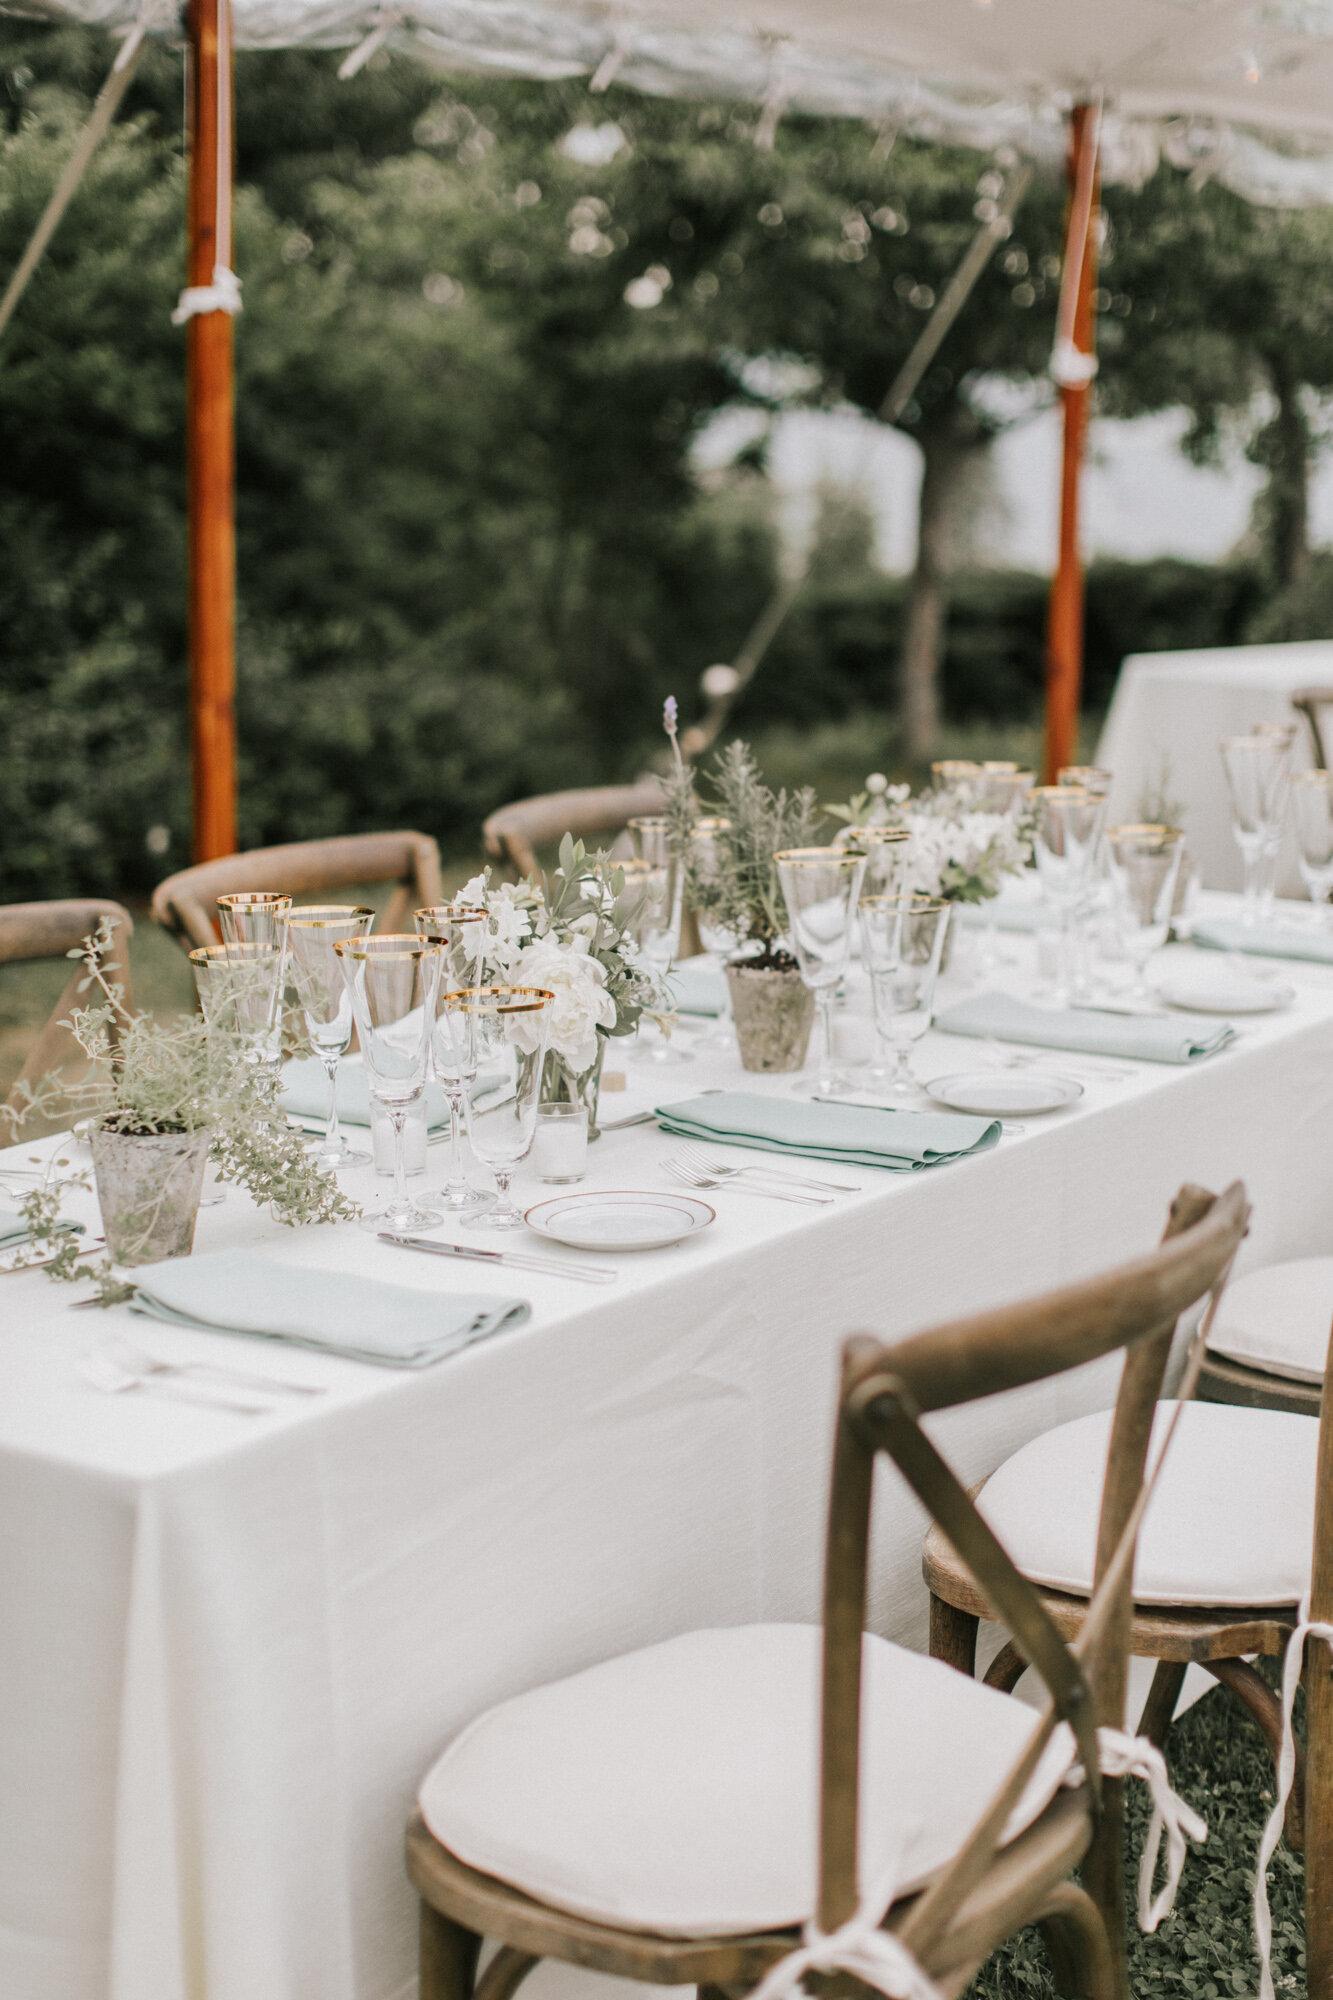 Chebeague+Island+Inn+Wedding+Maine+Jamie+Mercurio+Photography-0026.jpg